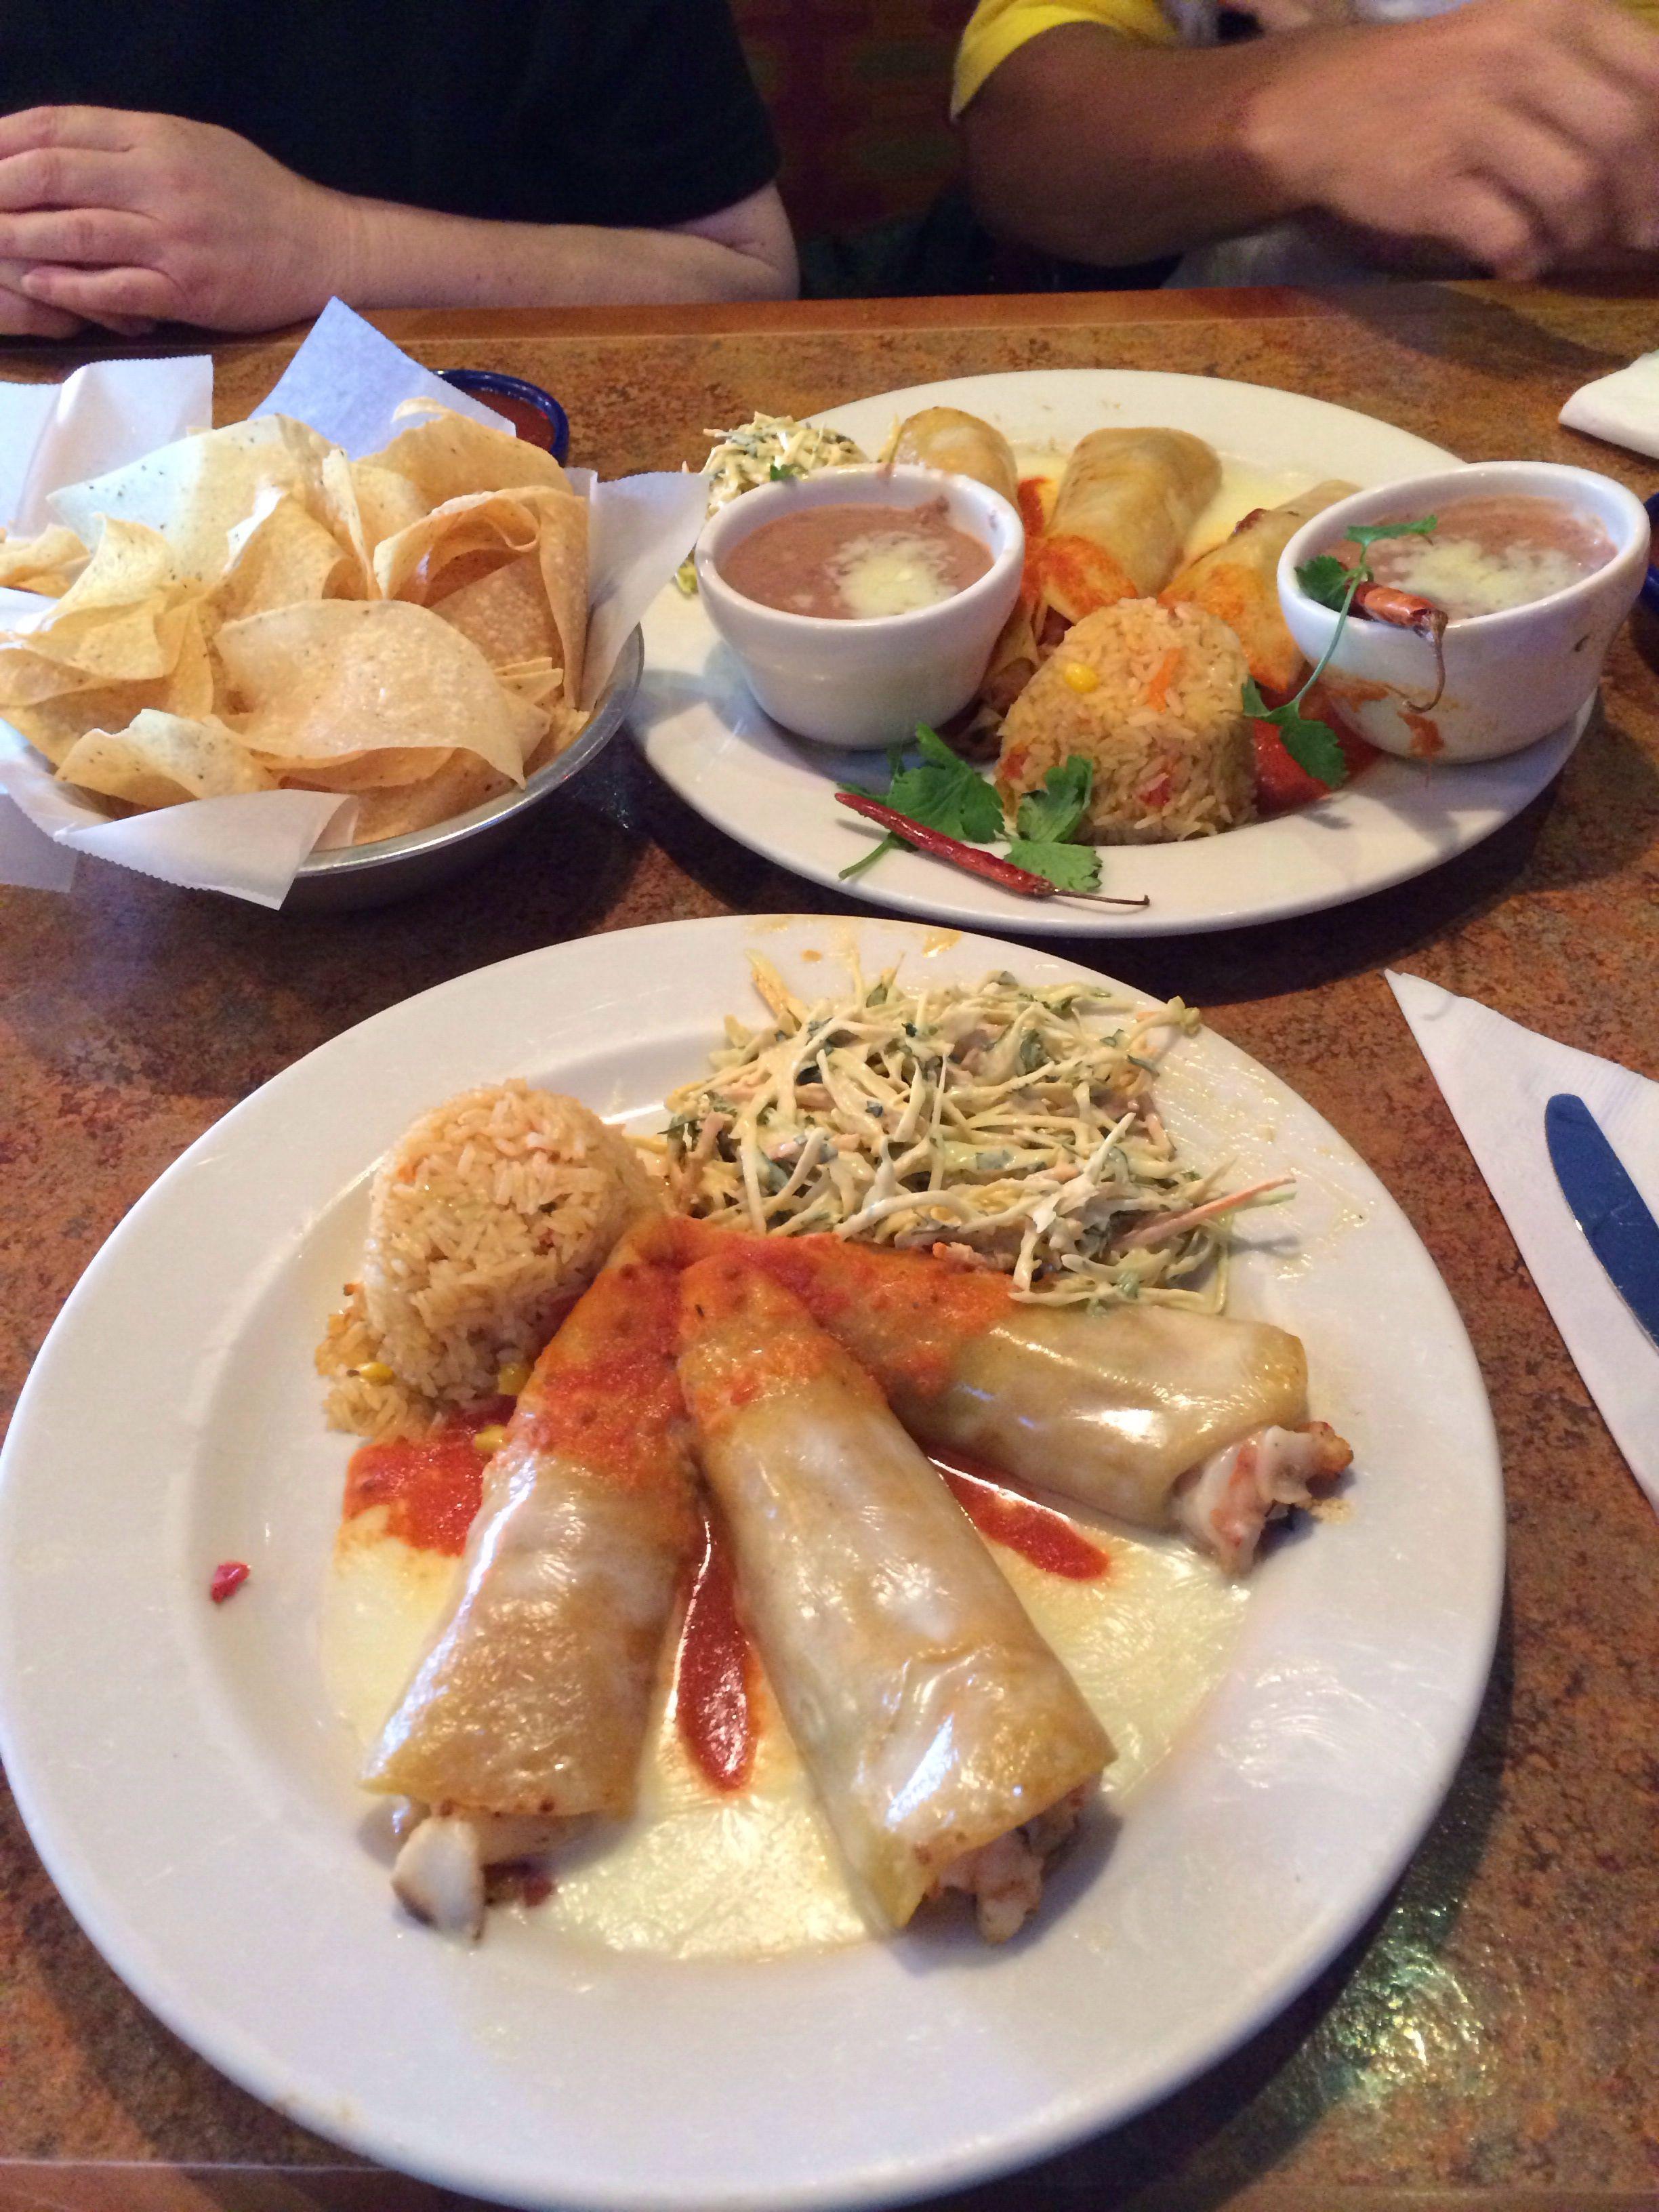 El Parrilla Mexican Restaurant In Savannah Georgia Some Of The